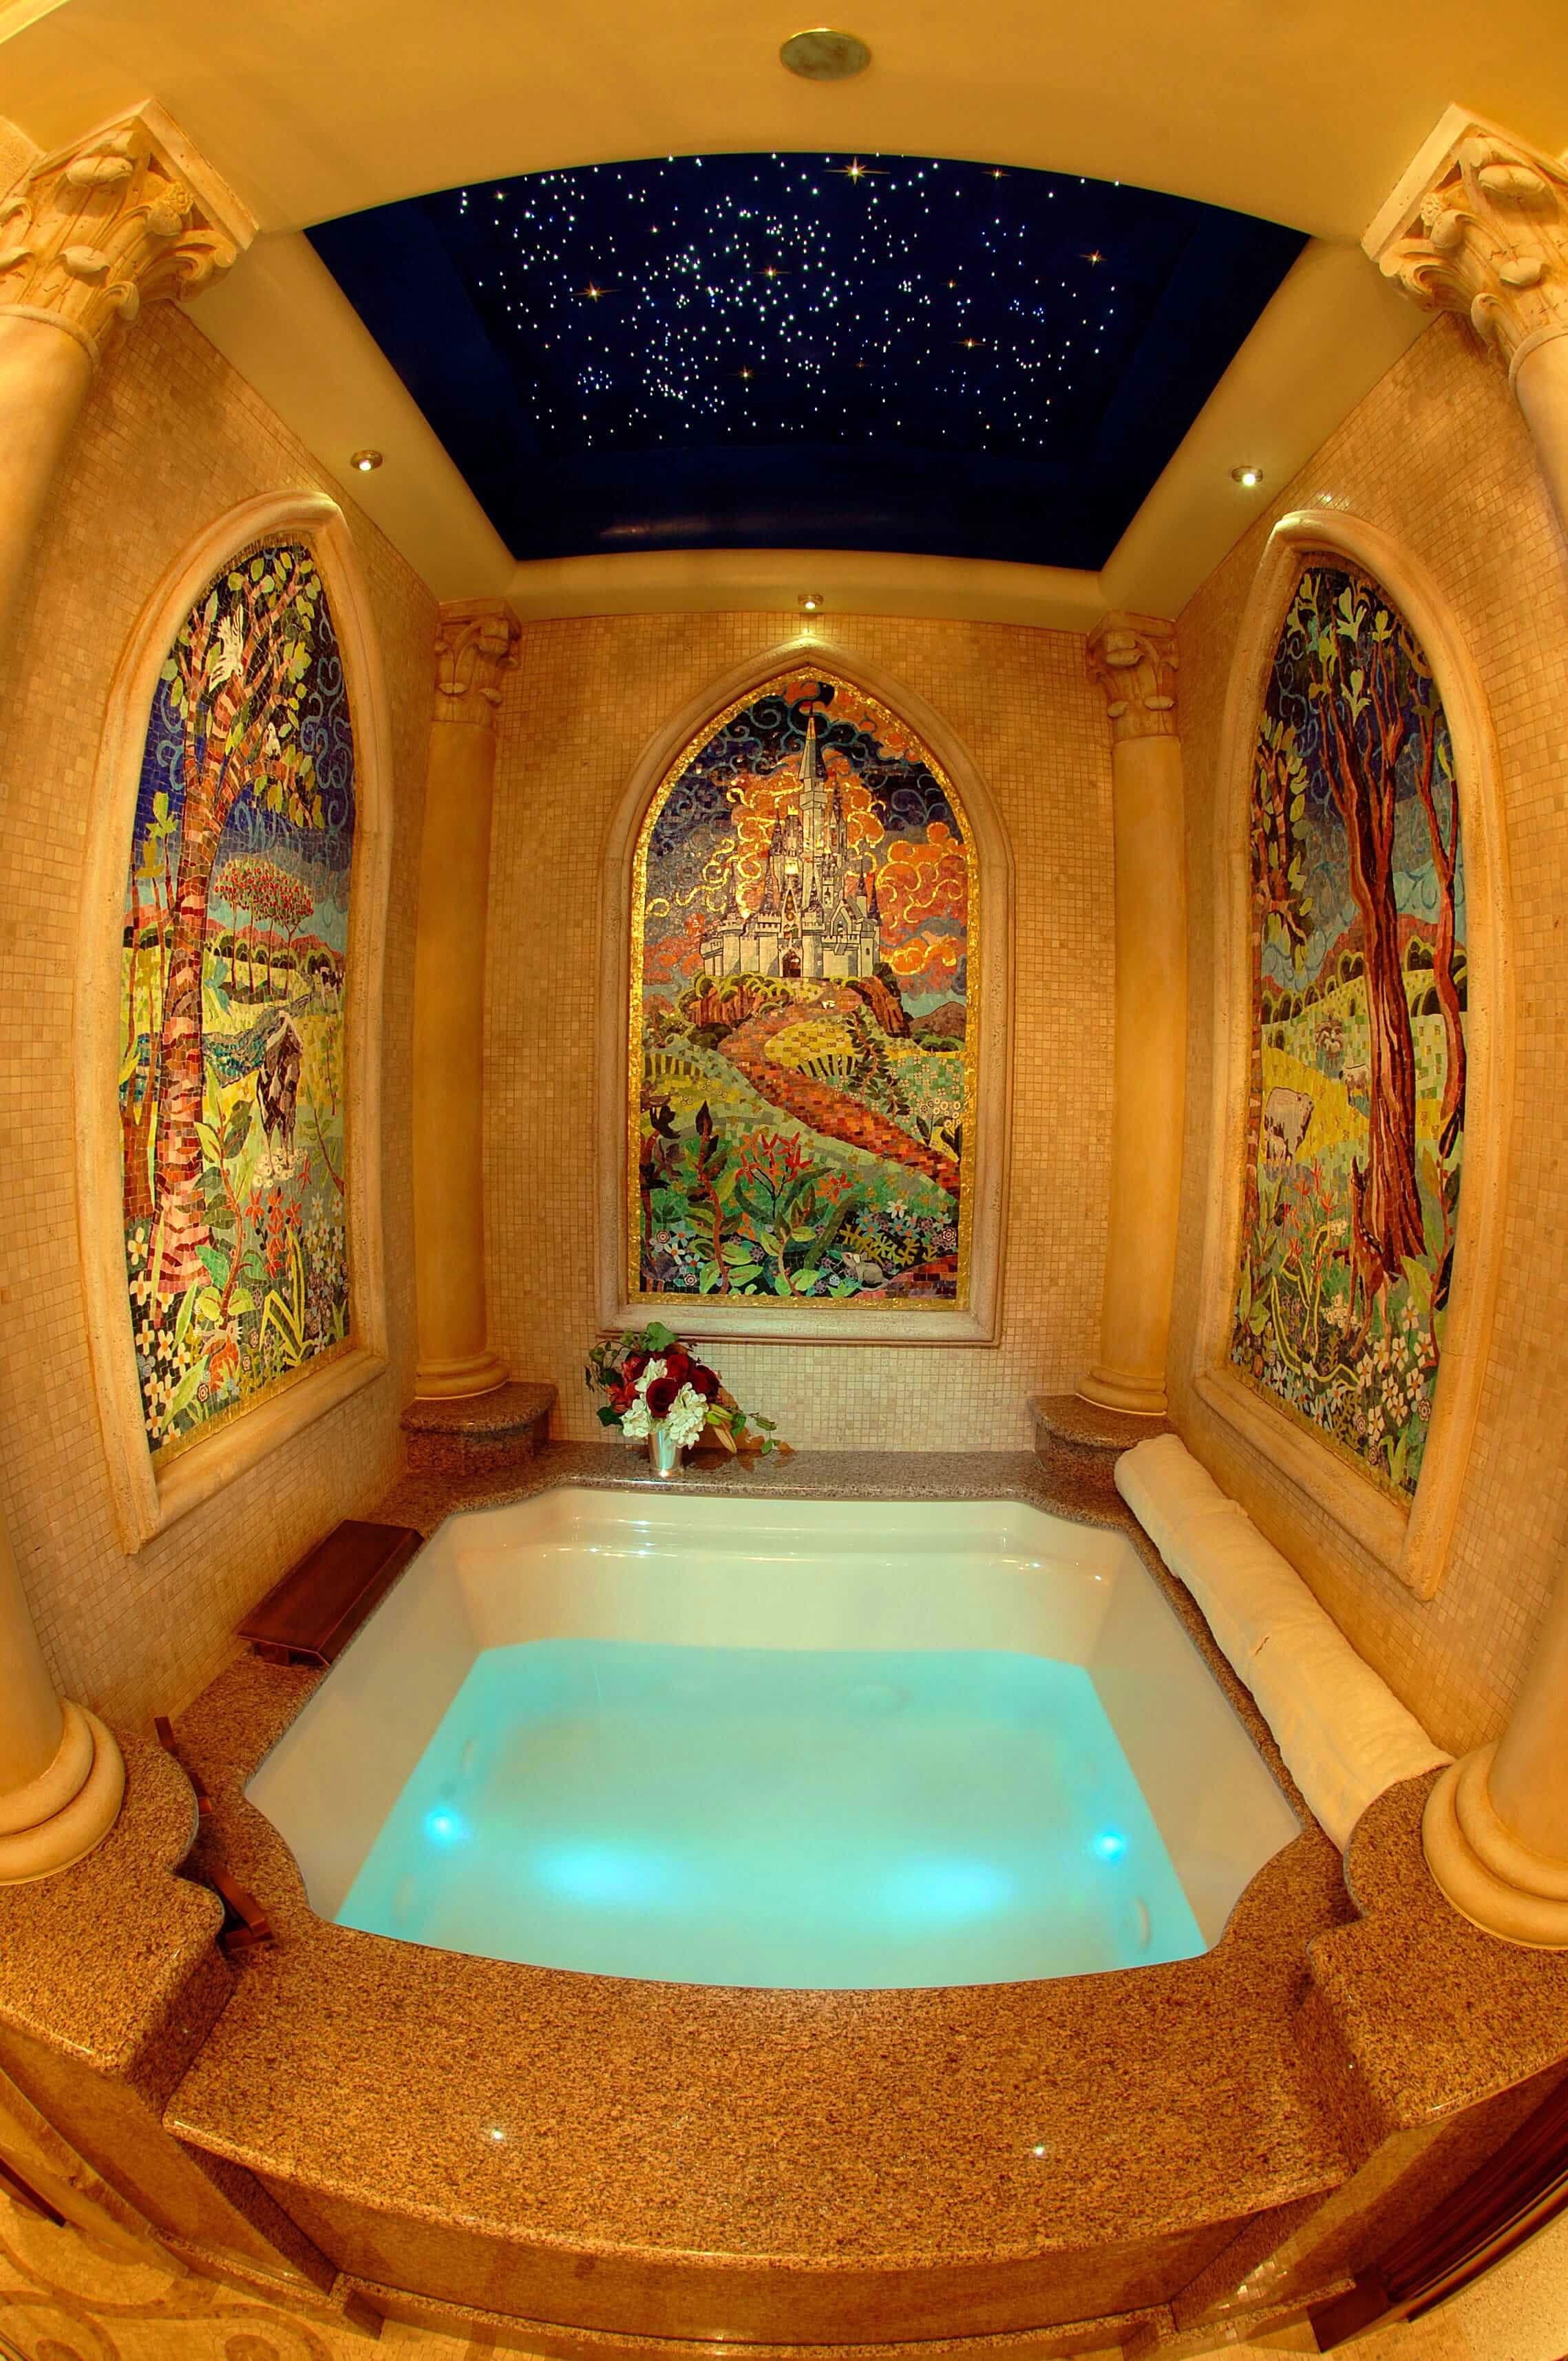 Travel News - cinderella bathtub